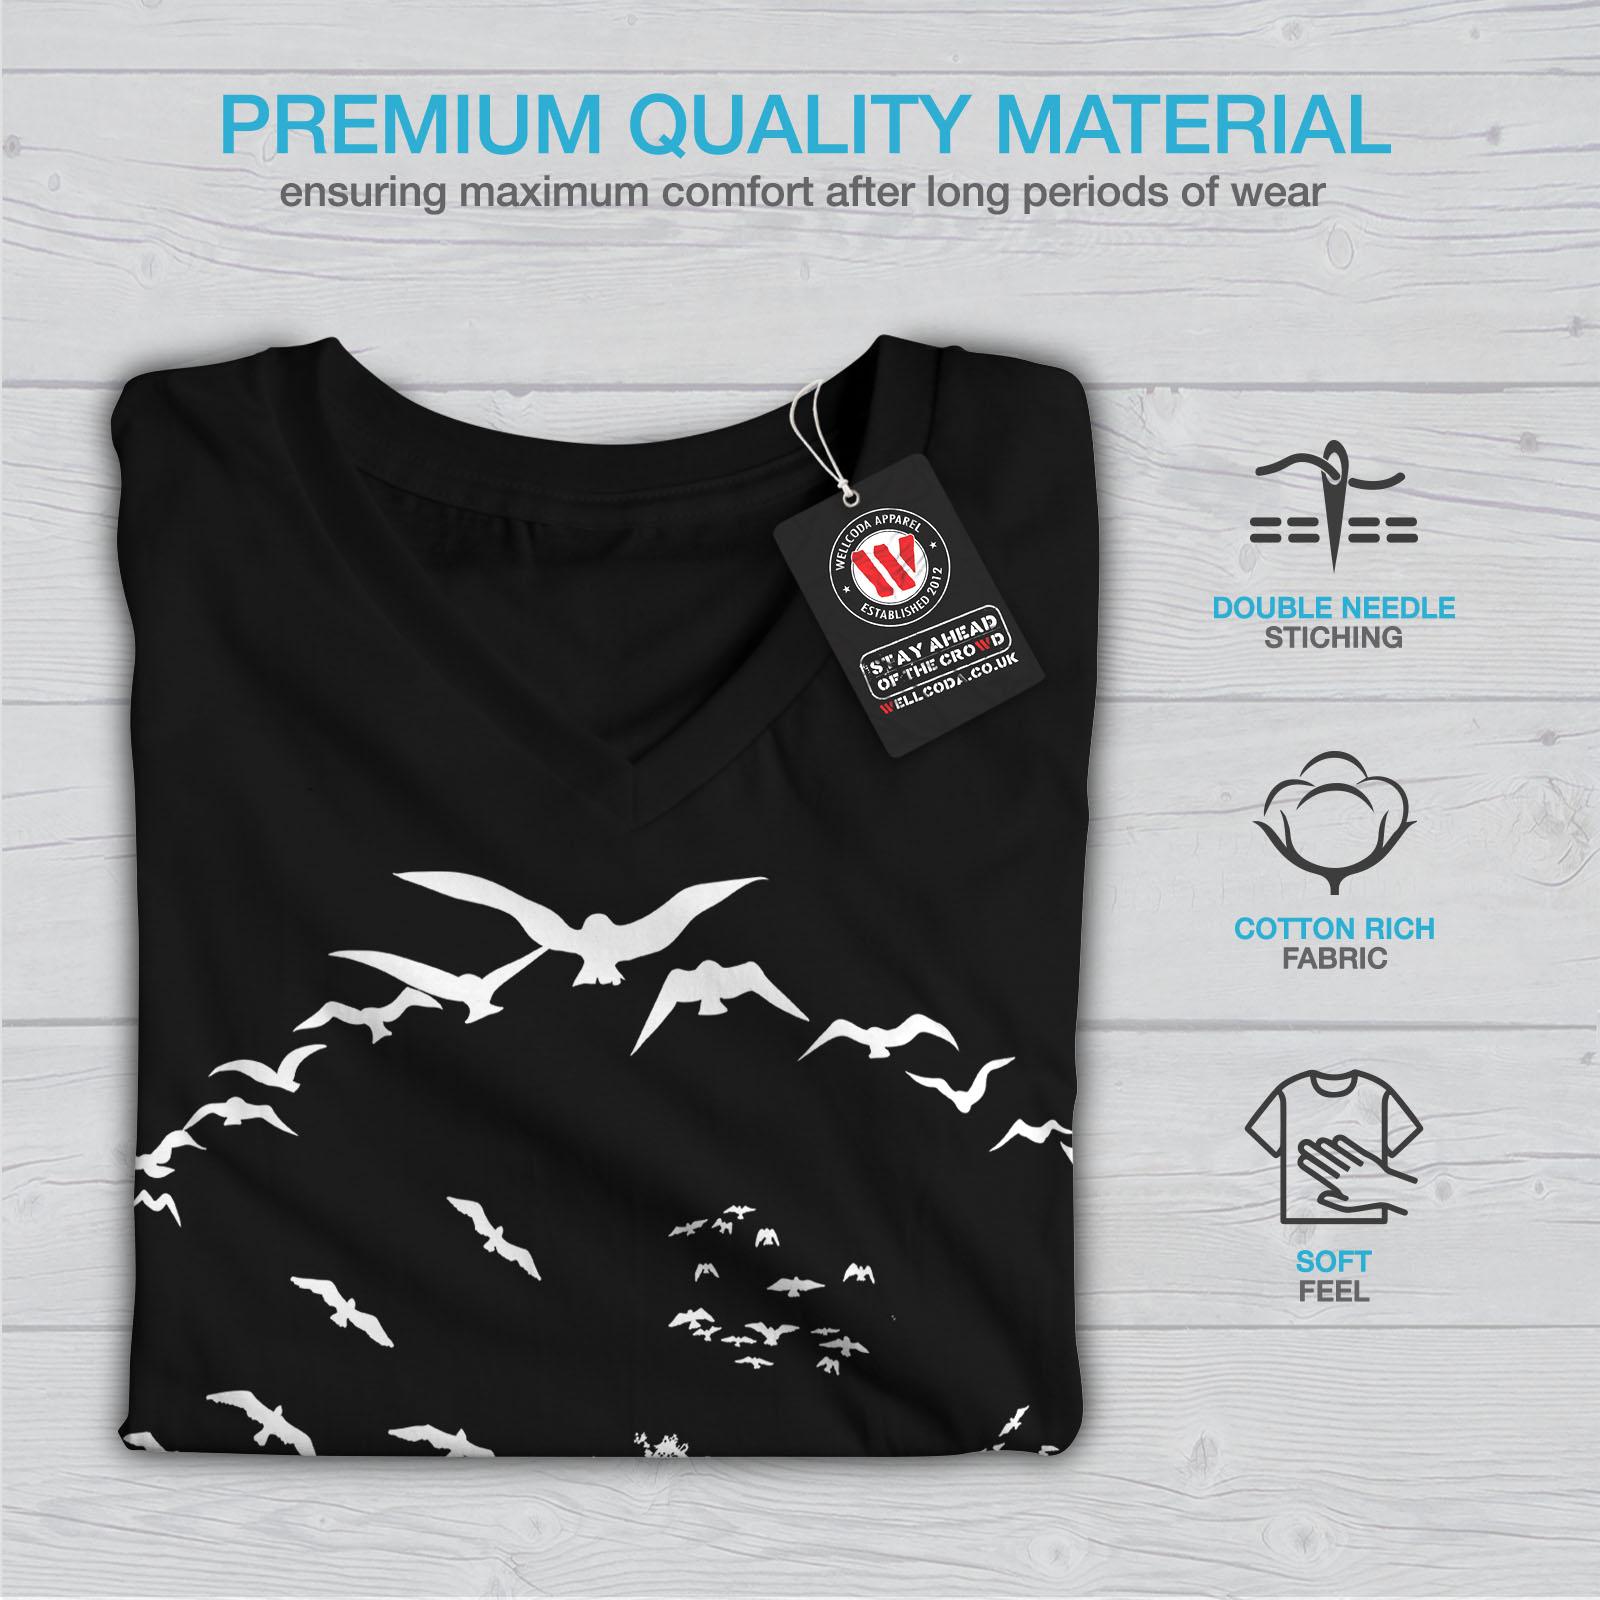 thumbnail 5 - Wellcoda-Bird-Freedom-Fly-Womens-V-Neck-T-shirt-Nature-Graphic-Design-Tee